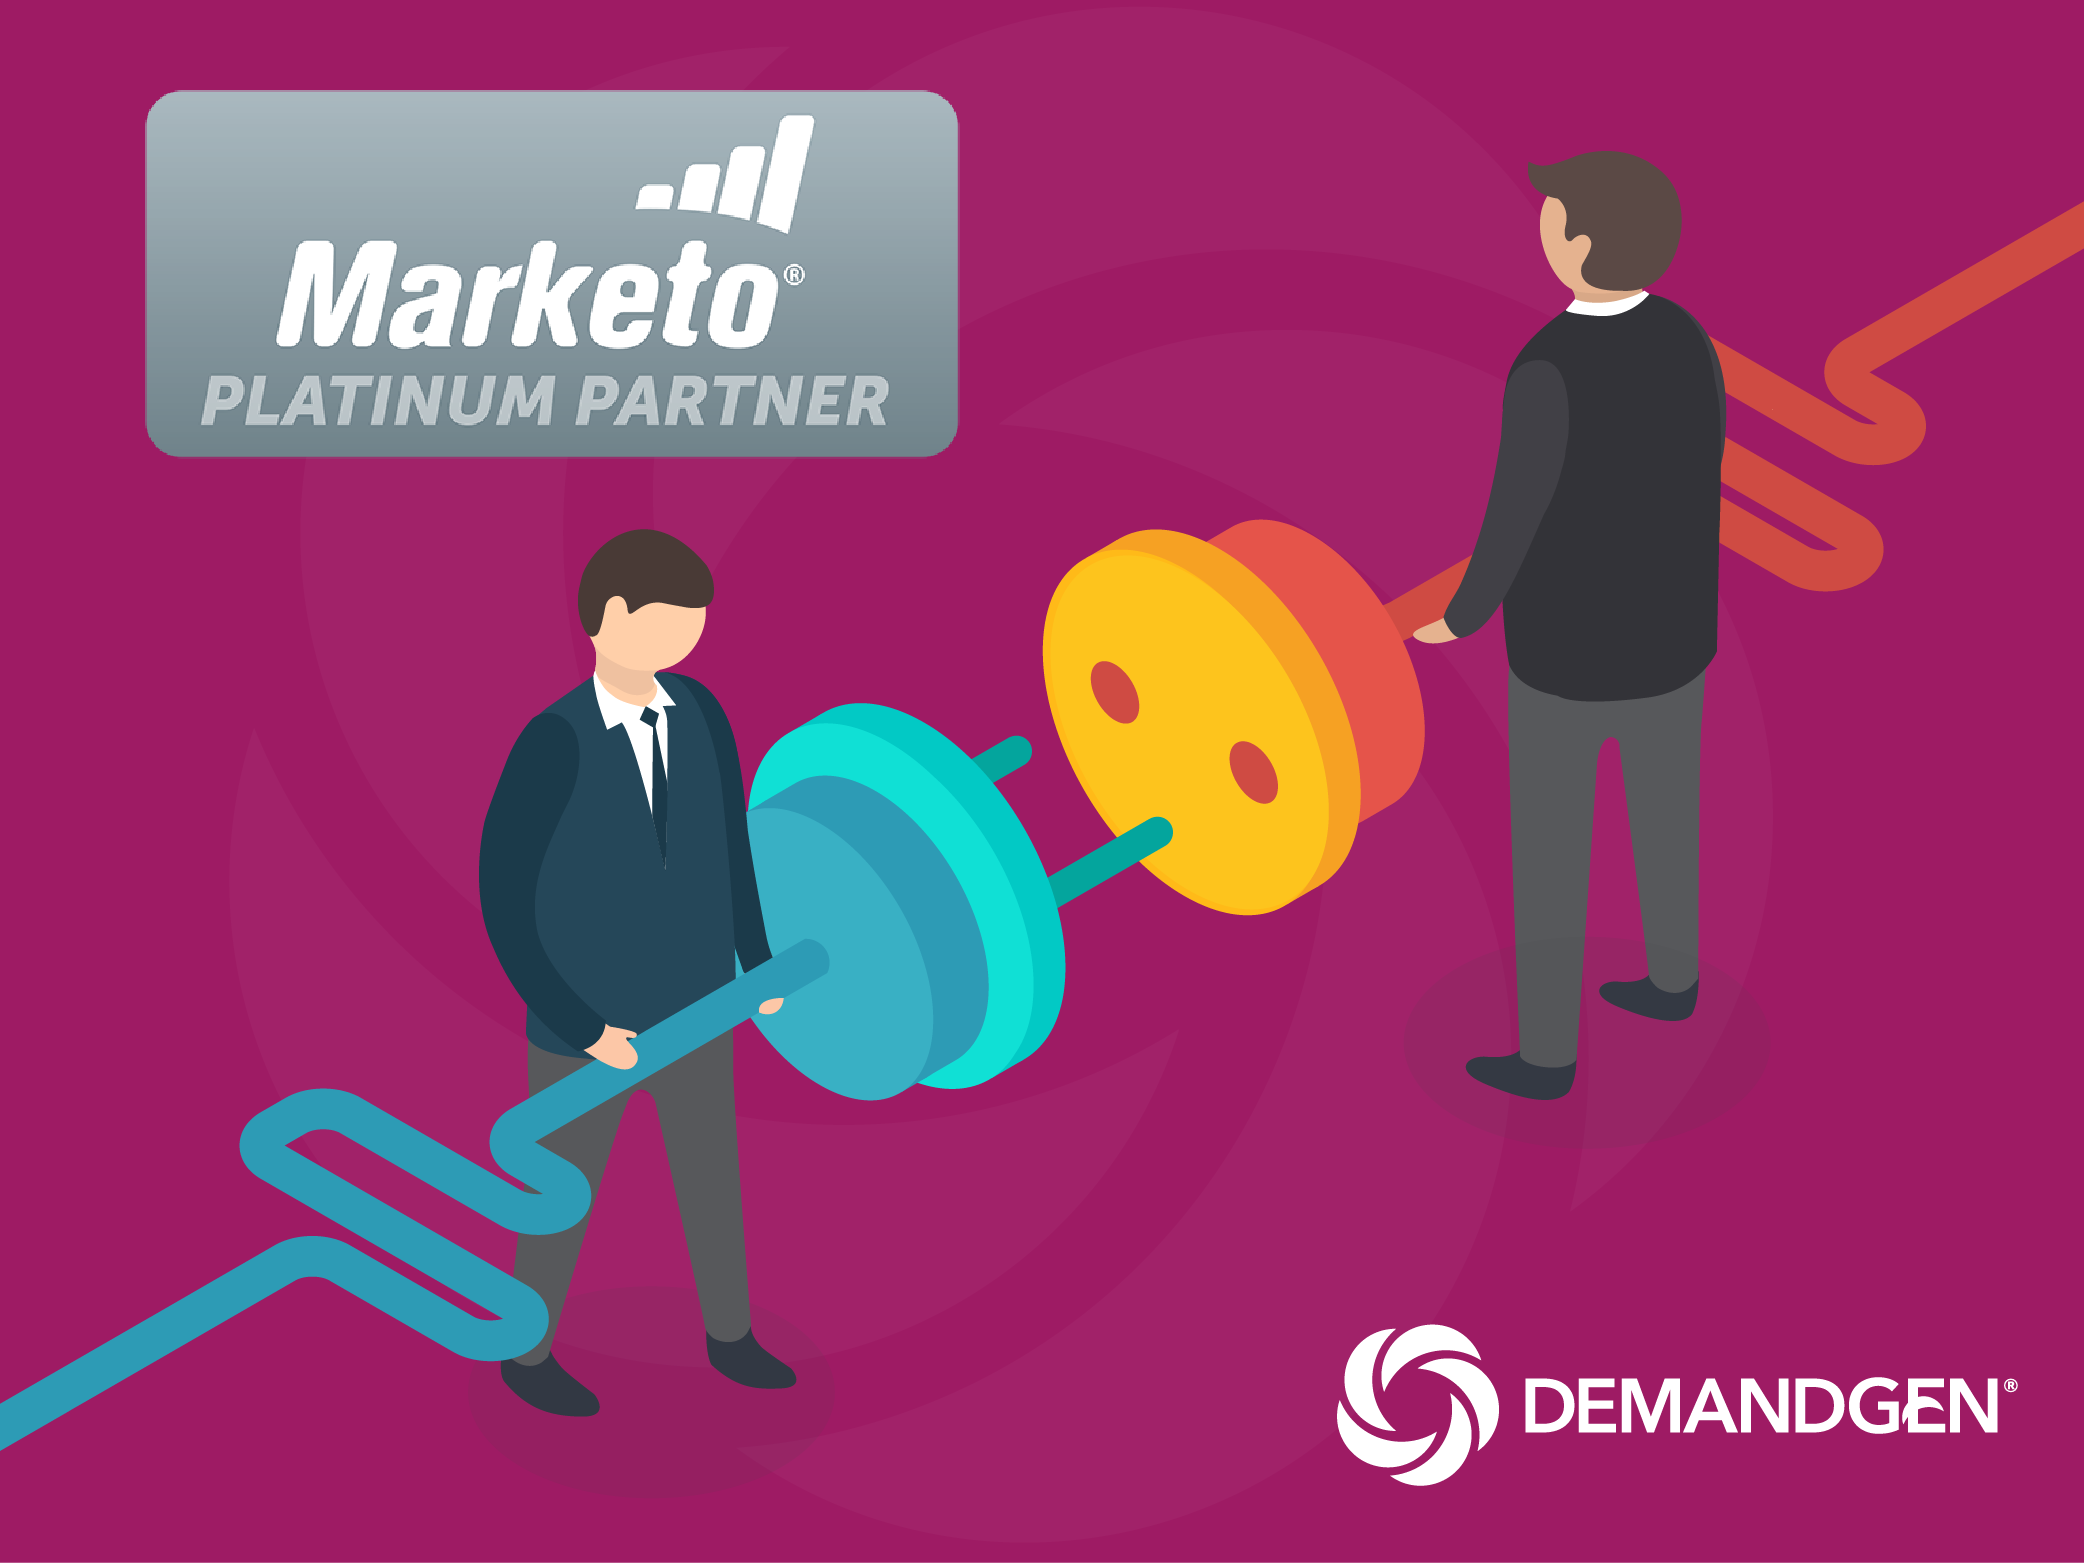 DemandGen Named Platinum Partner and Finalist for Digital Services Partner of the Year by Marketo®